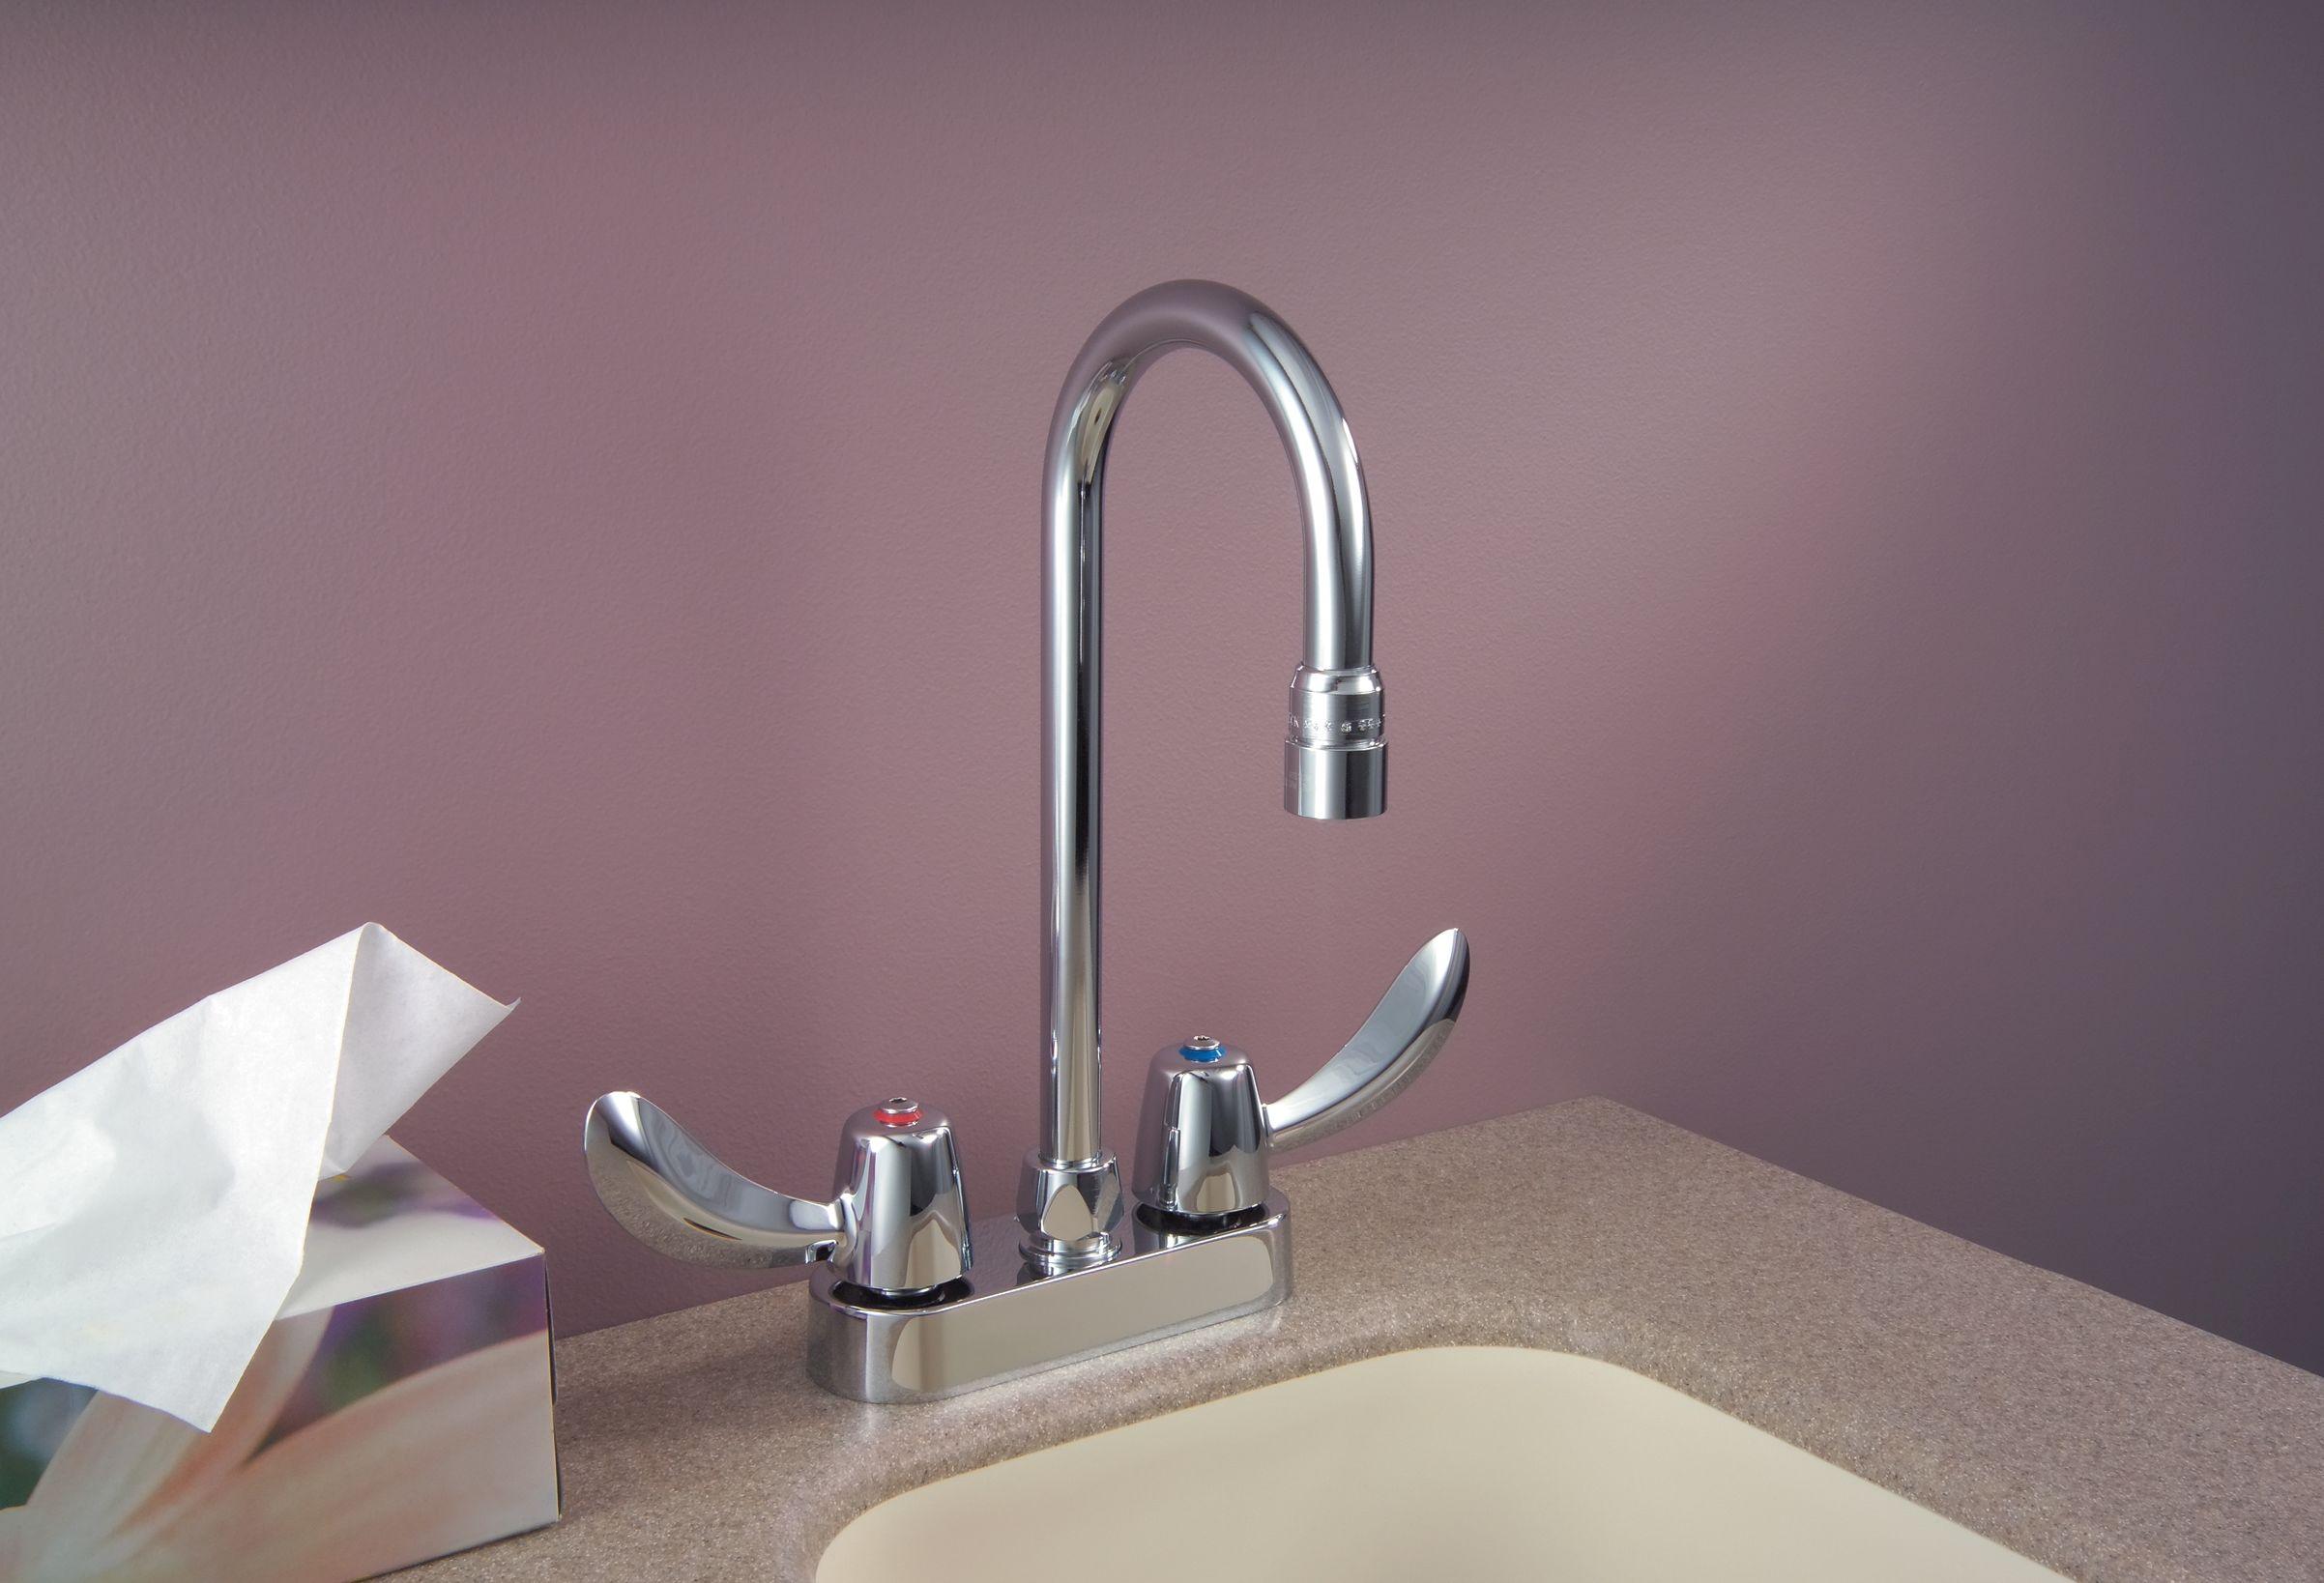 tesla dst up delta com centerset lifetime bathroom brilliance drain assembly ssmpu warranty with stainless pnmpu includes mpu pop faucet widespread